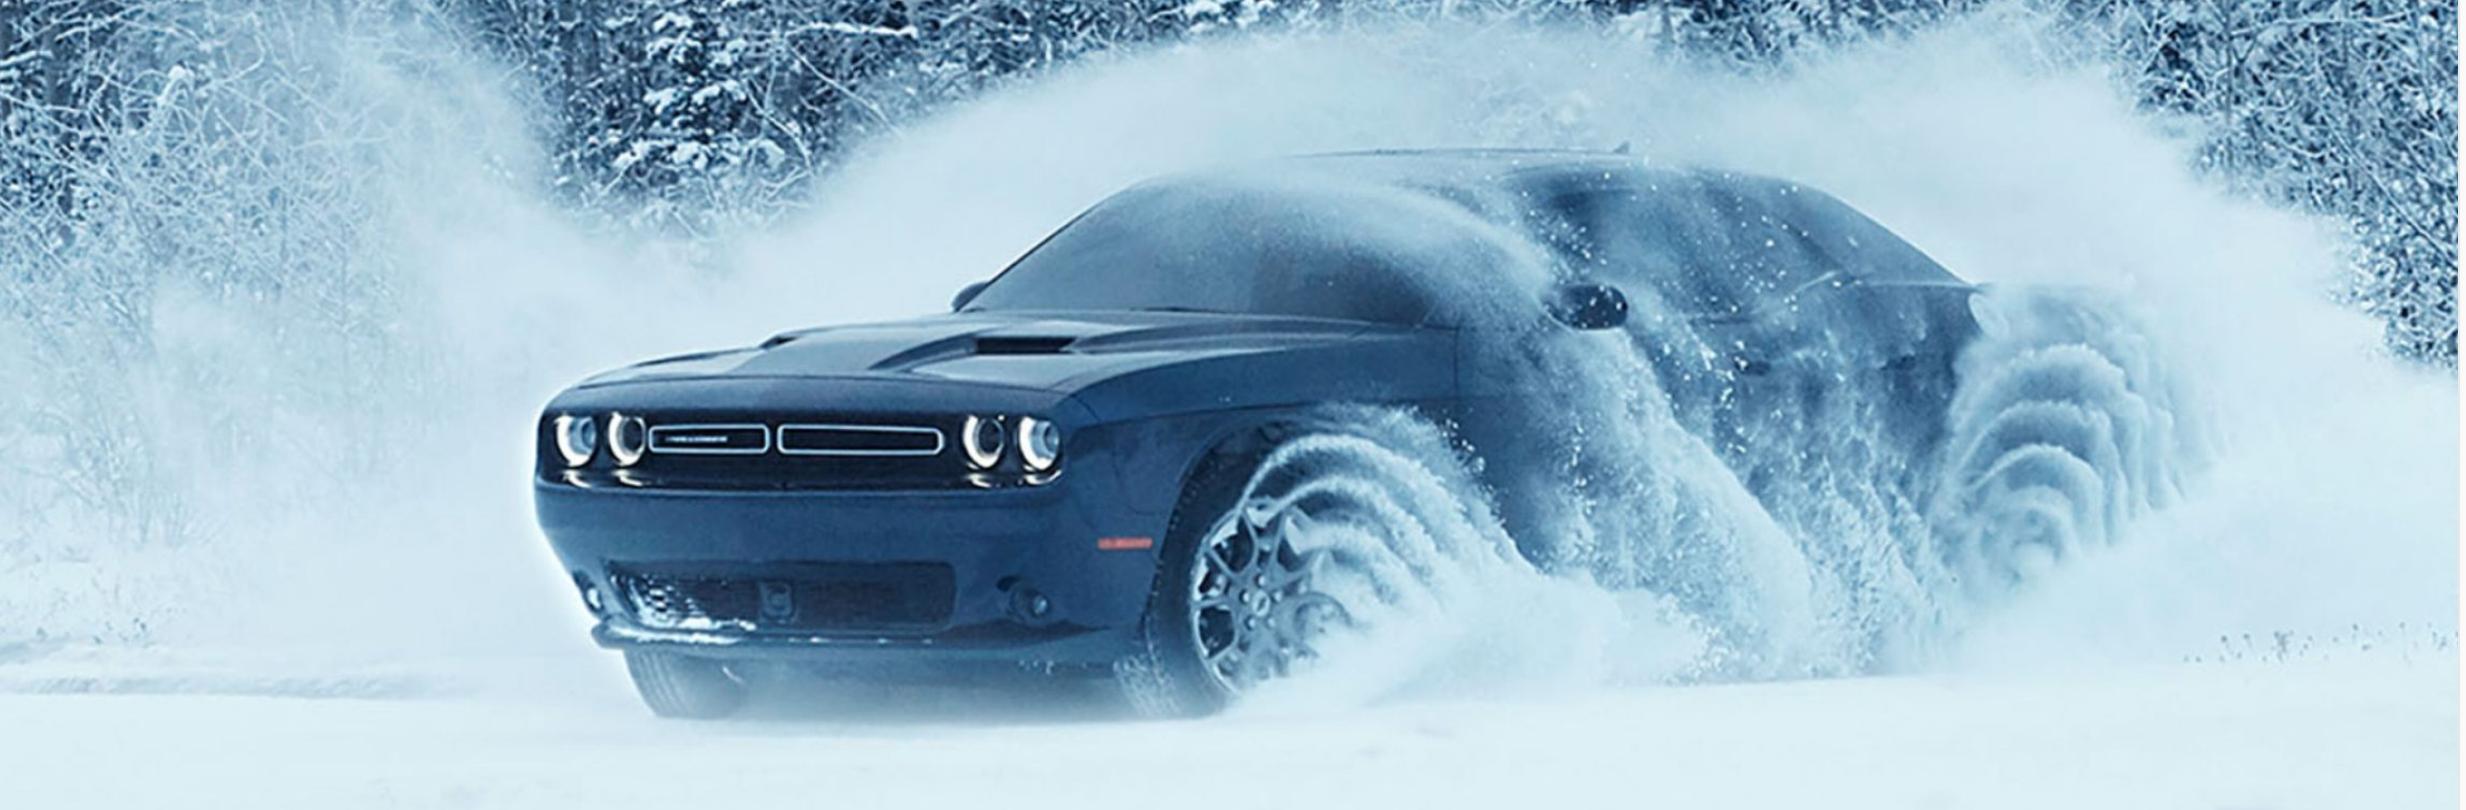 Dodge Snow